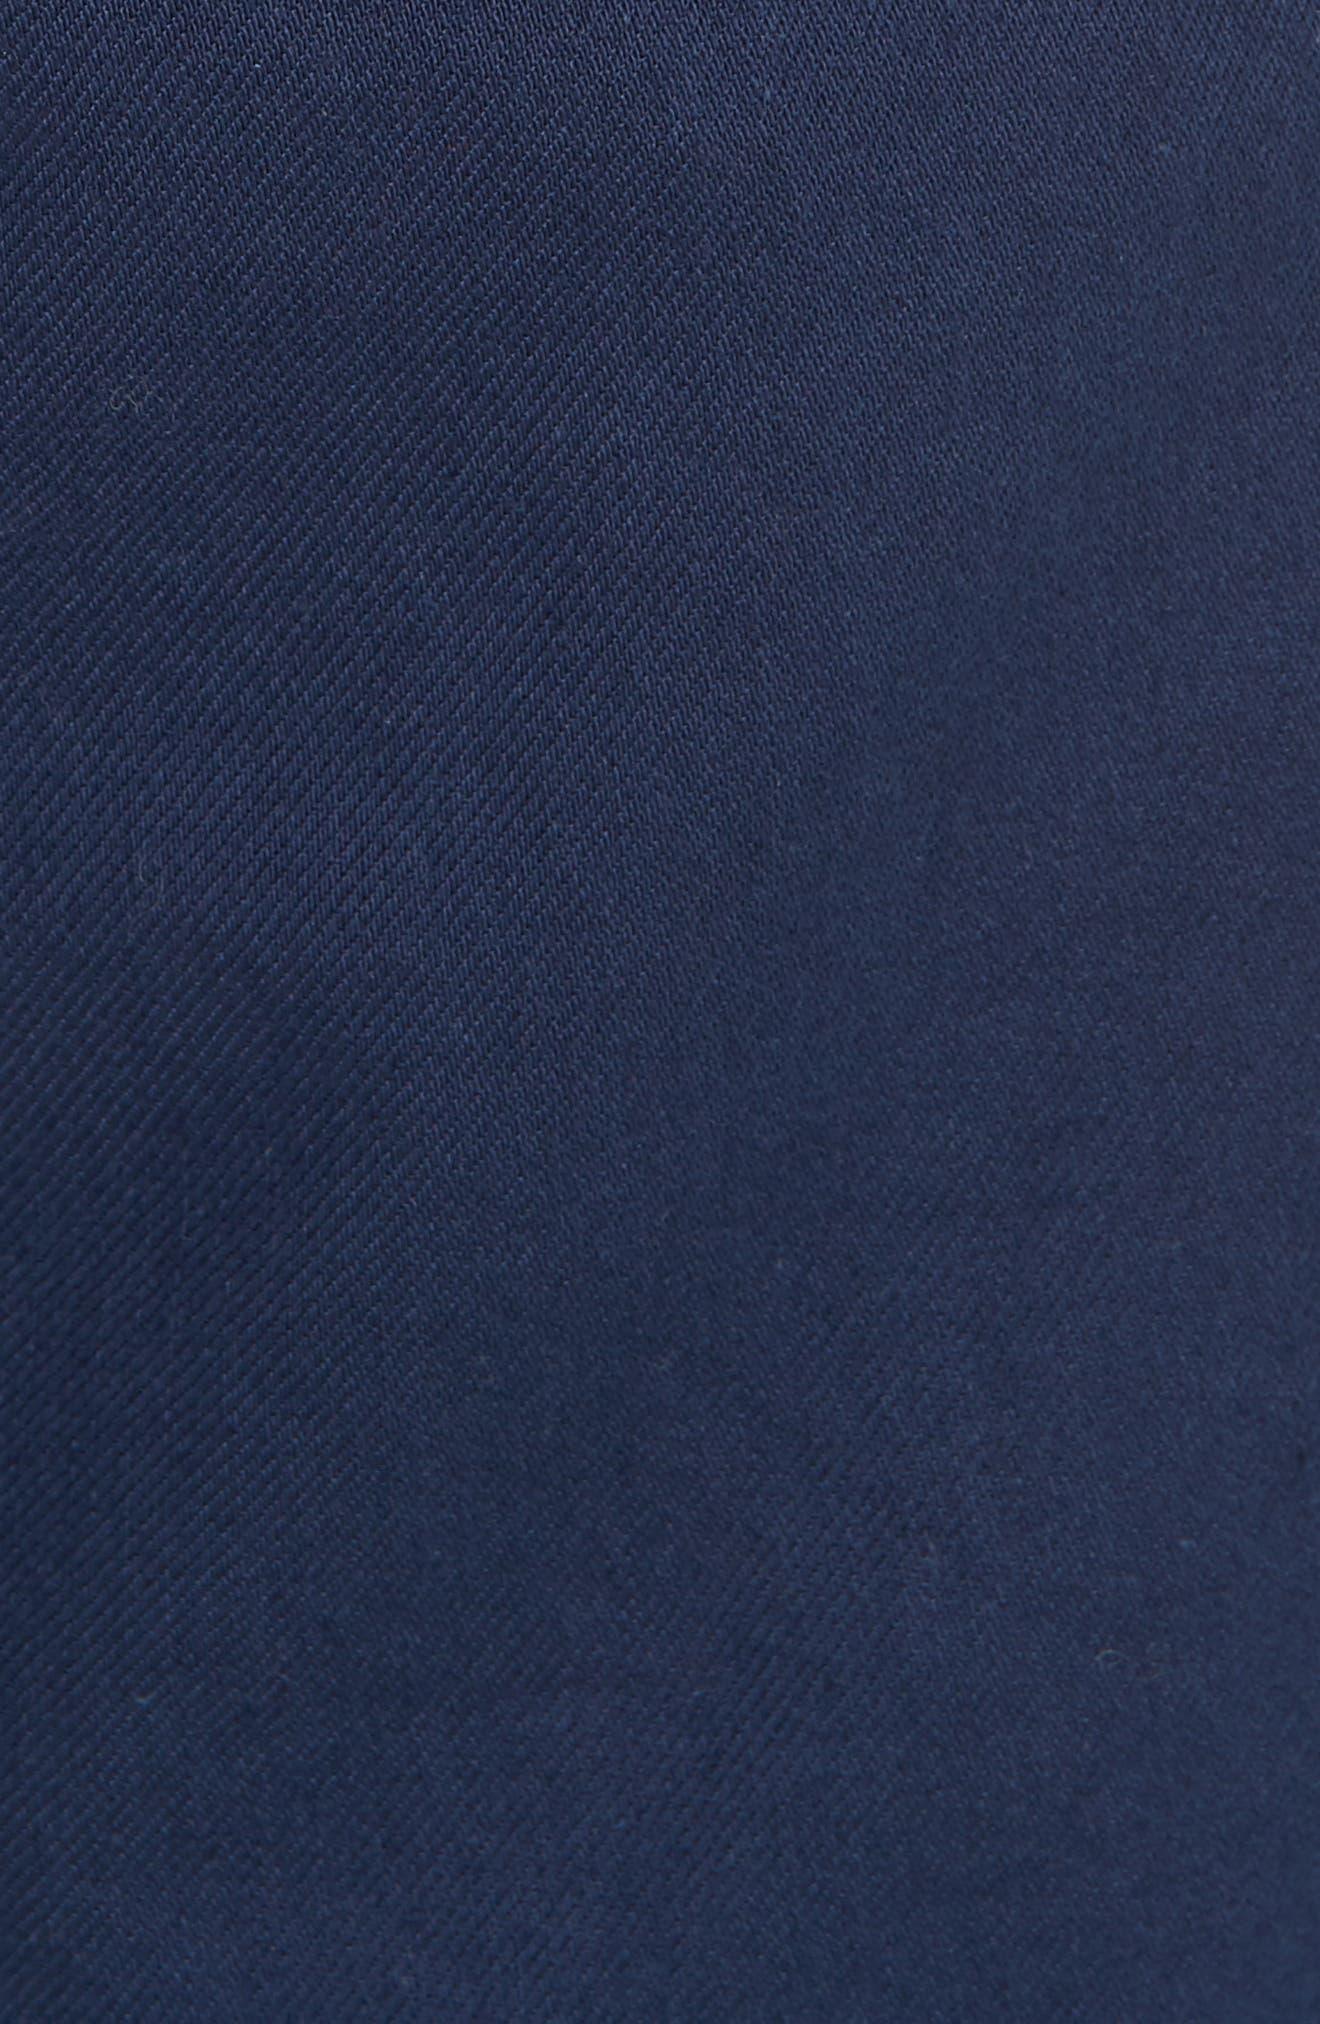 Organic Cotton Walking Shorts,                             Alternate thumbnail 5, color,                             INDIGO